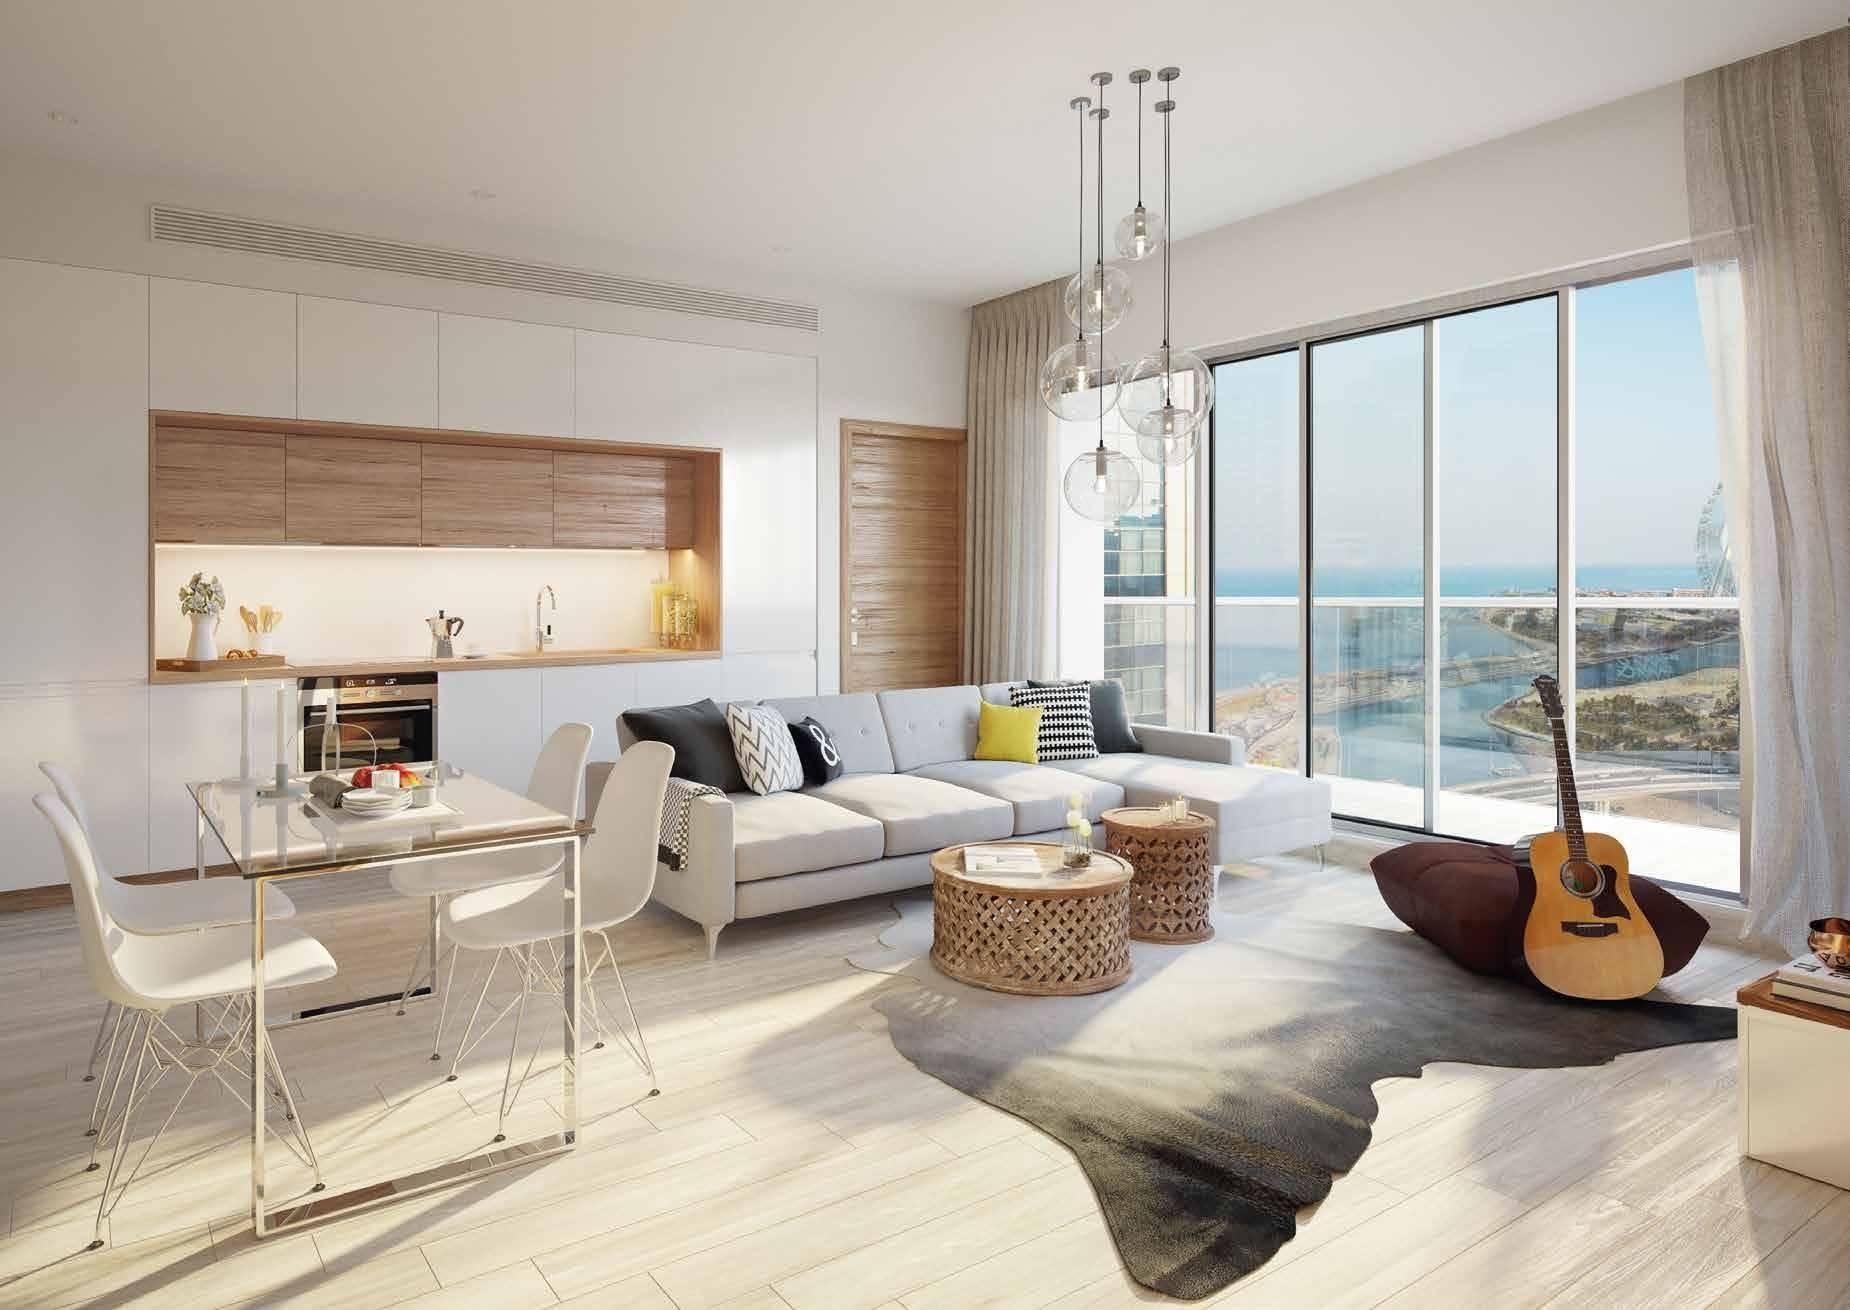 Апартаменты, sale в Studio One Дубай, ОАЭ